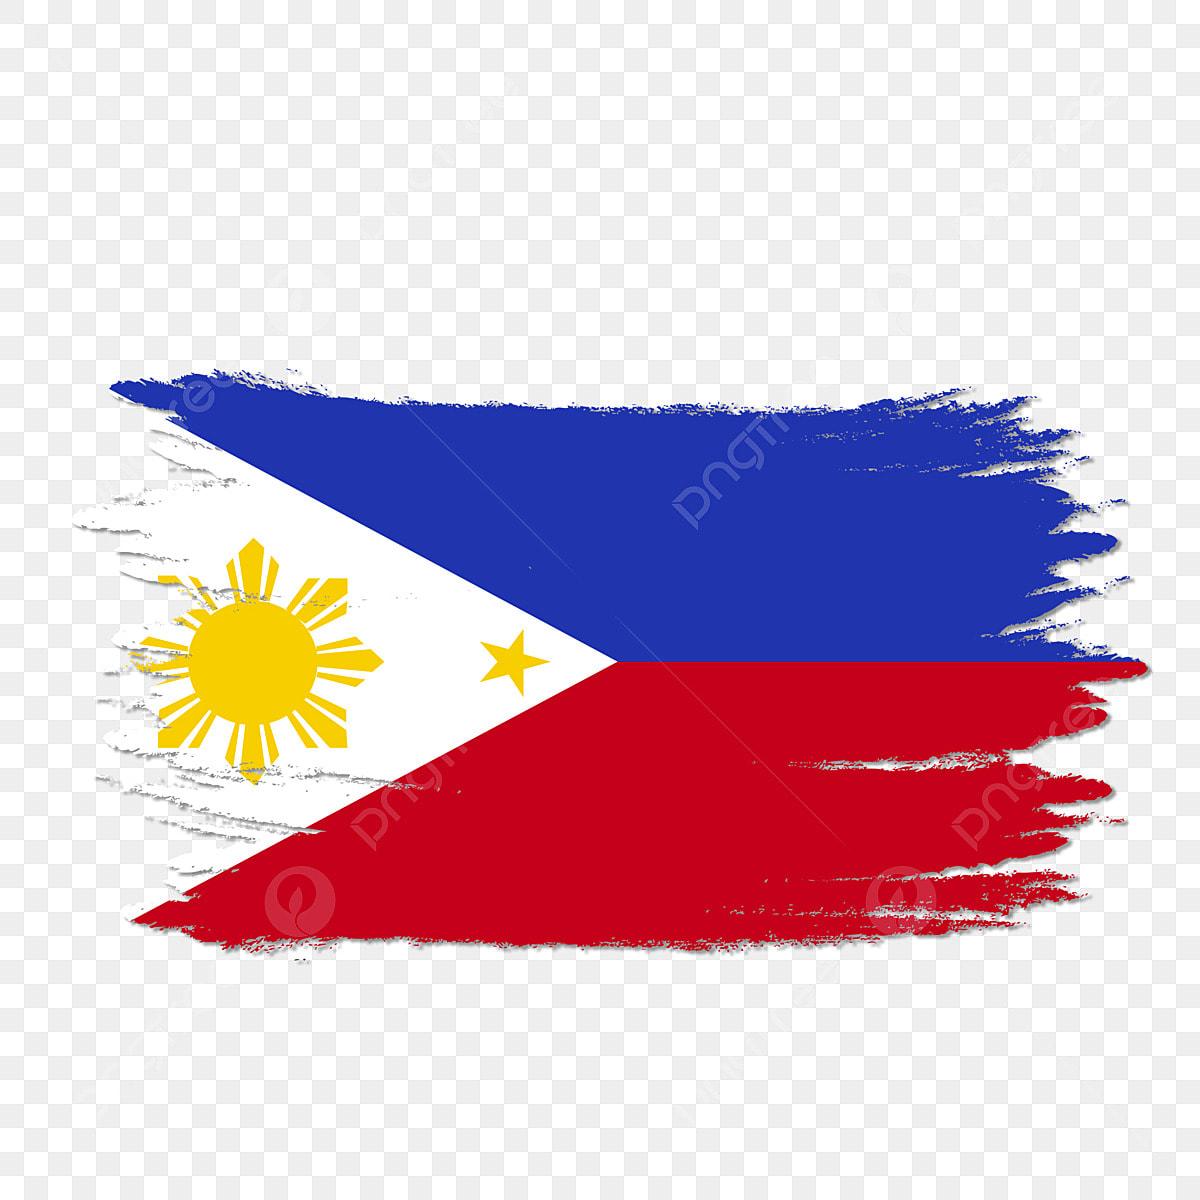 Philippines Flag Transparent Watercolor Painted Brush, Philippines, Philippines Flag